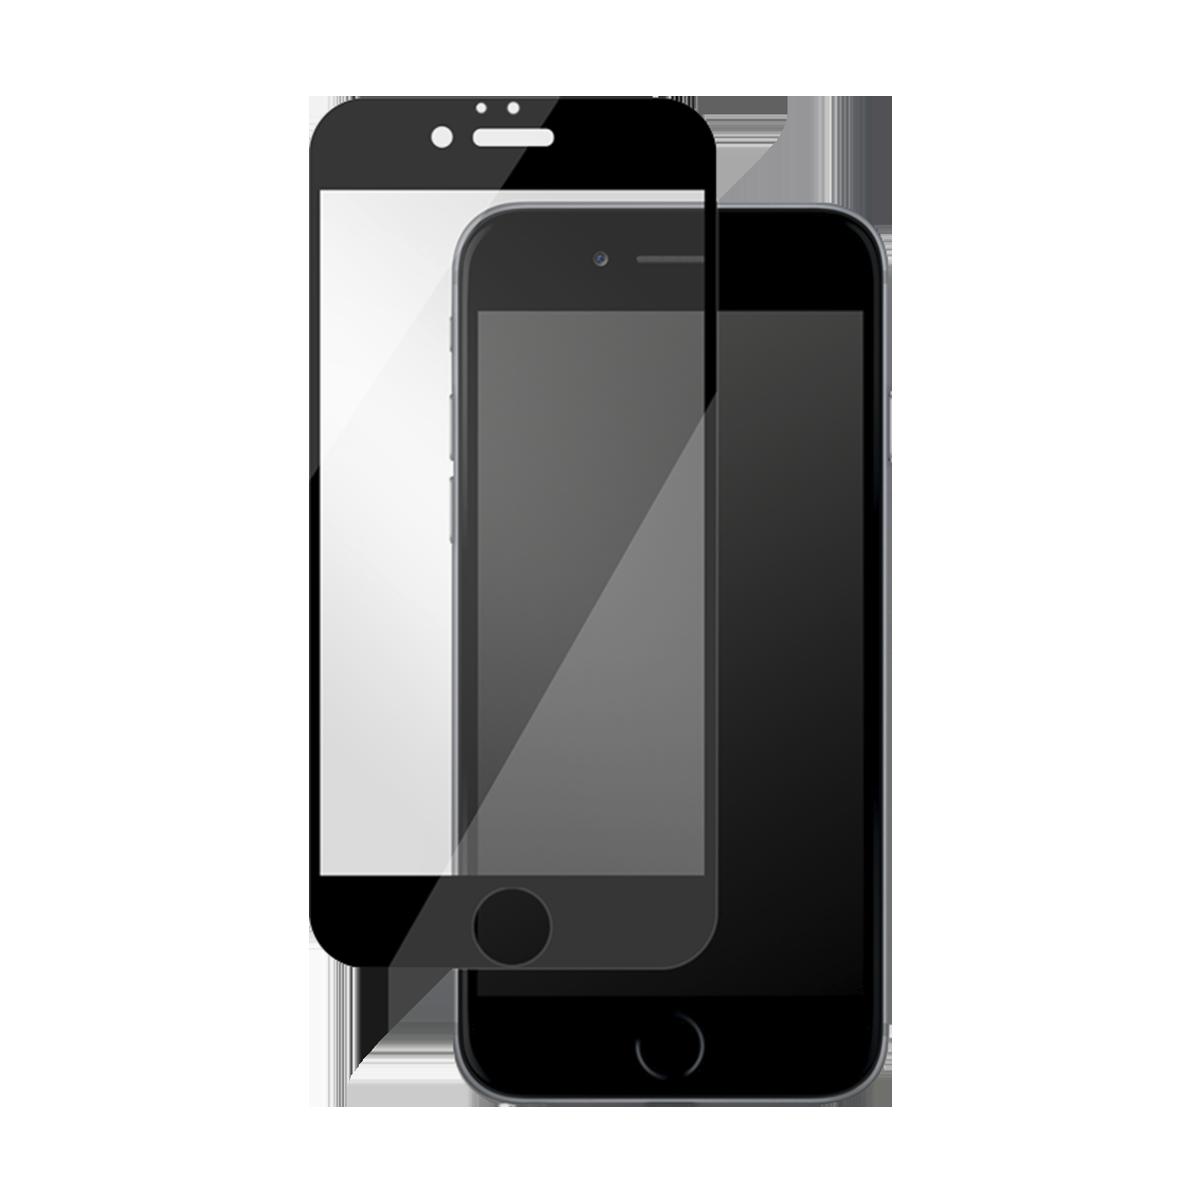 iPhone 7/8 için spada Mat Tam kaplayan Siyah Ekran koruma camı